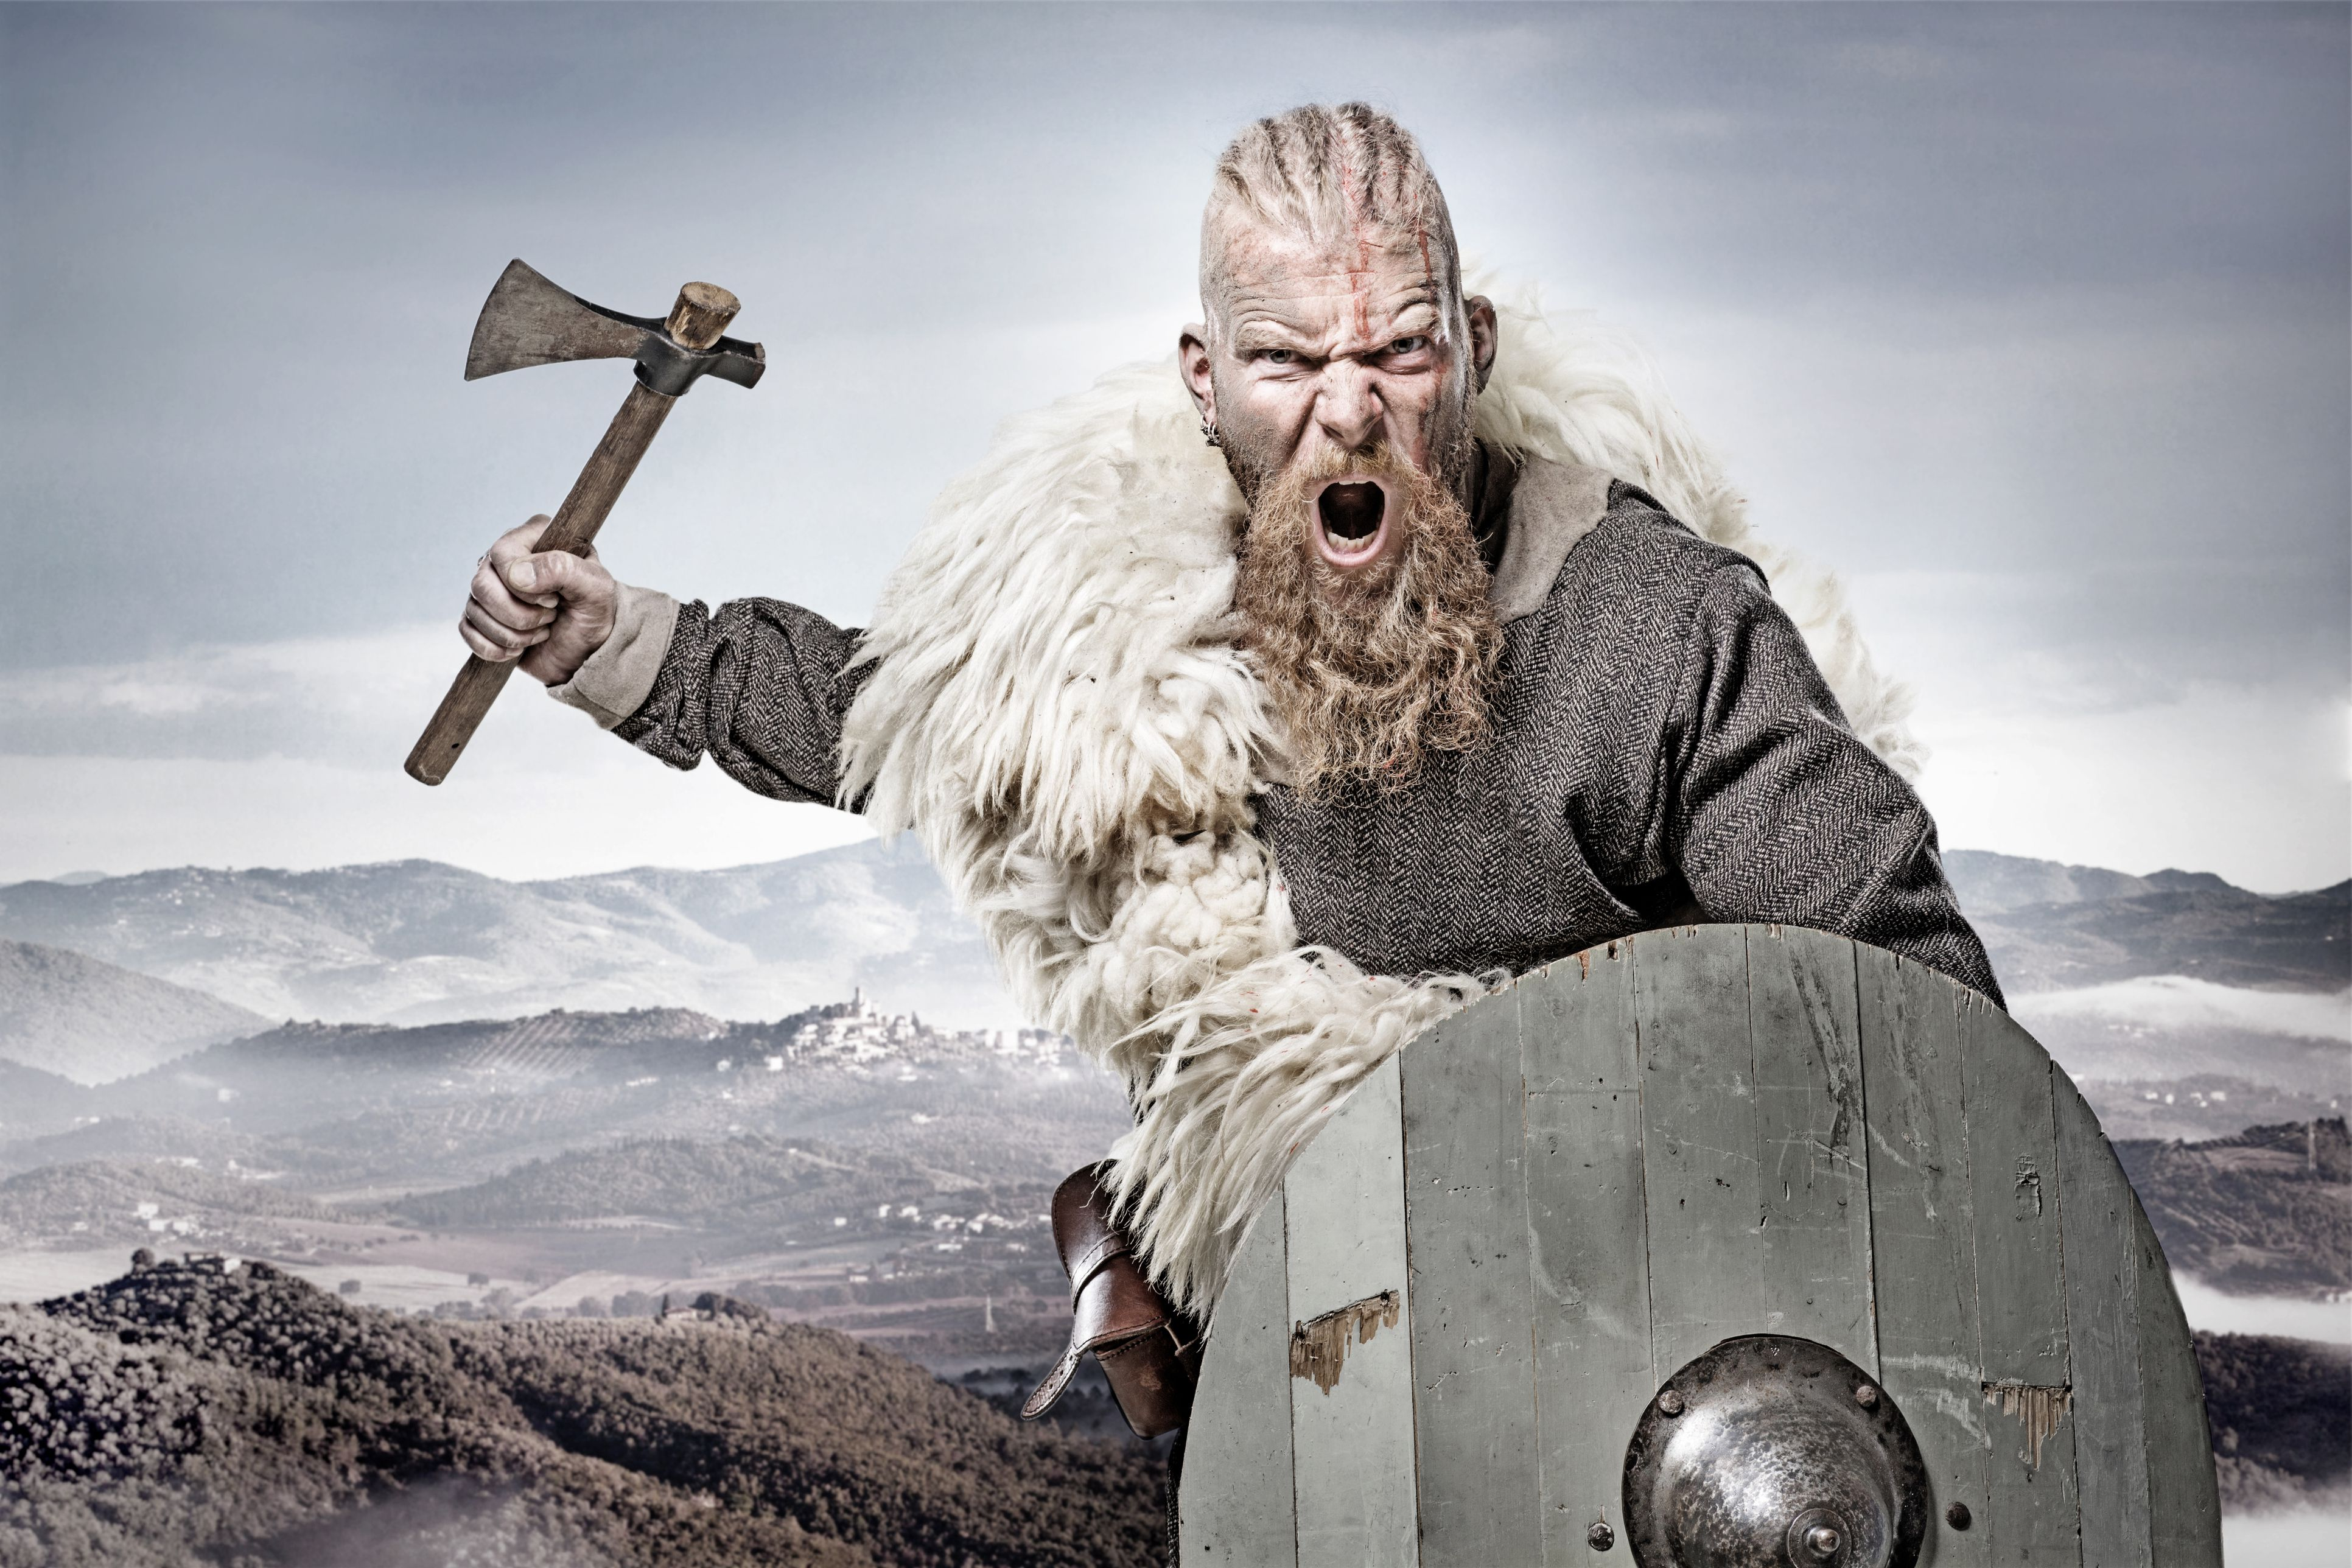 Viking warrior against mountain range